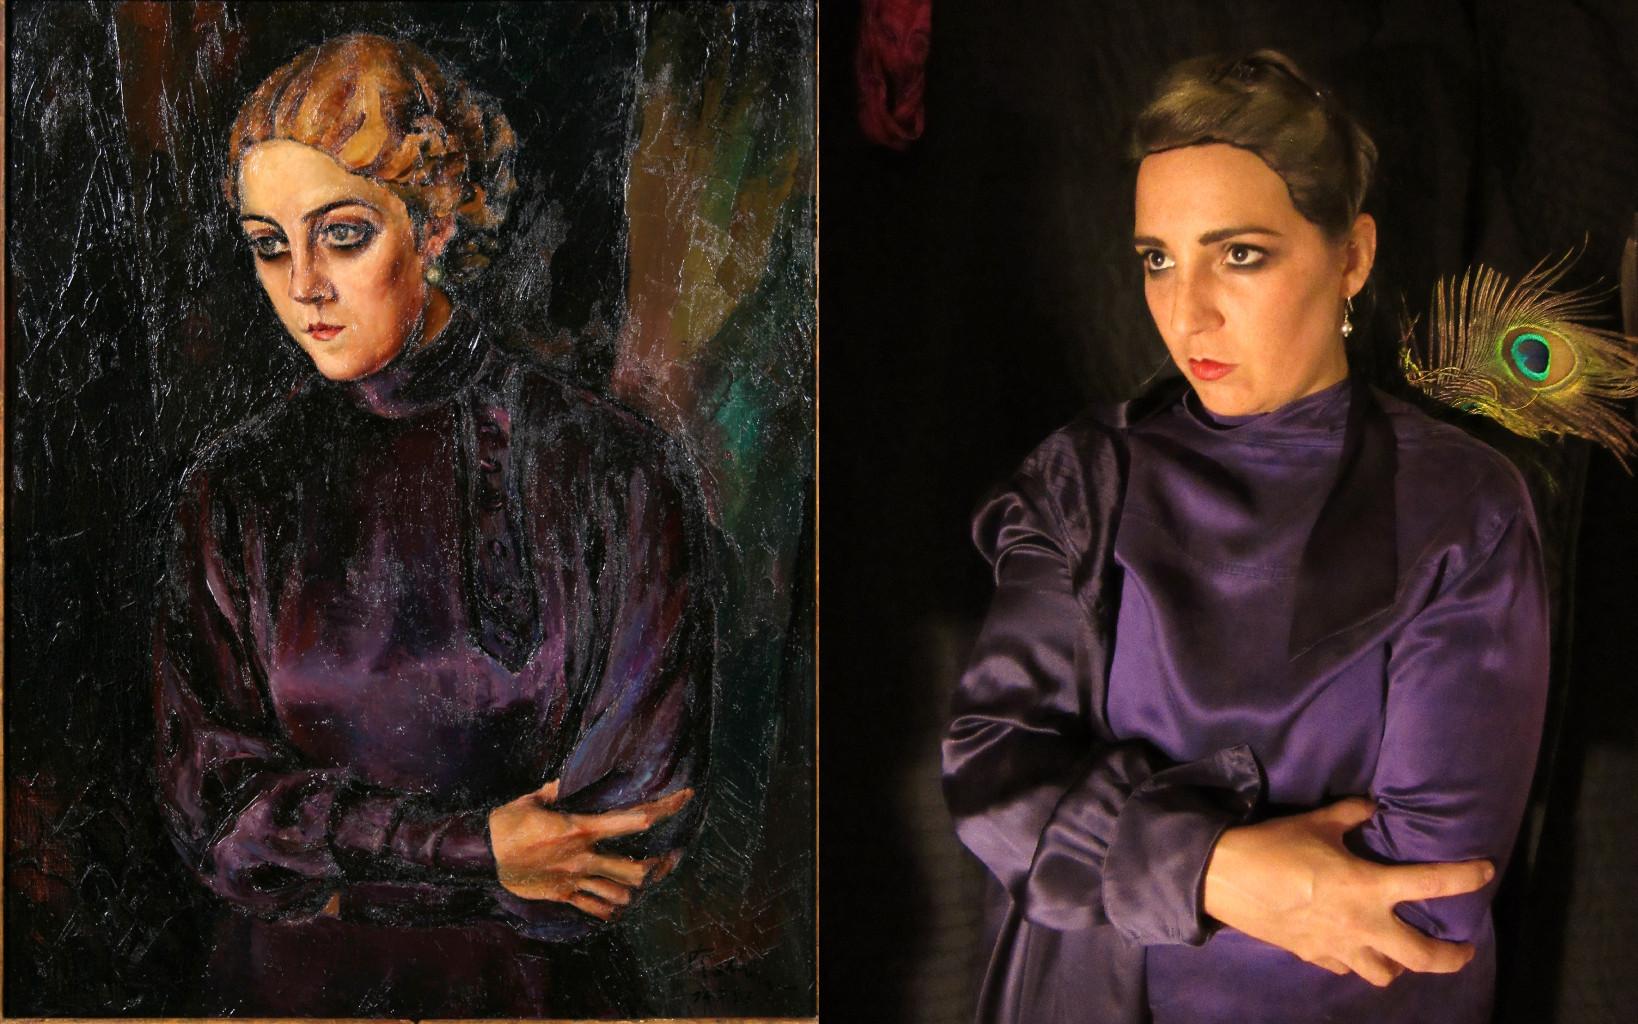 Portrait of a Woman with Smokey Eyes, Harry Rabinger (1895-1966) vanGo'd by Daniela Harris